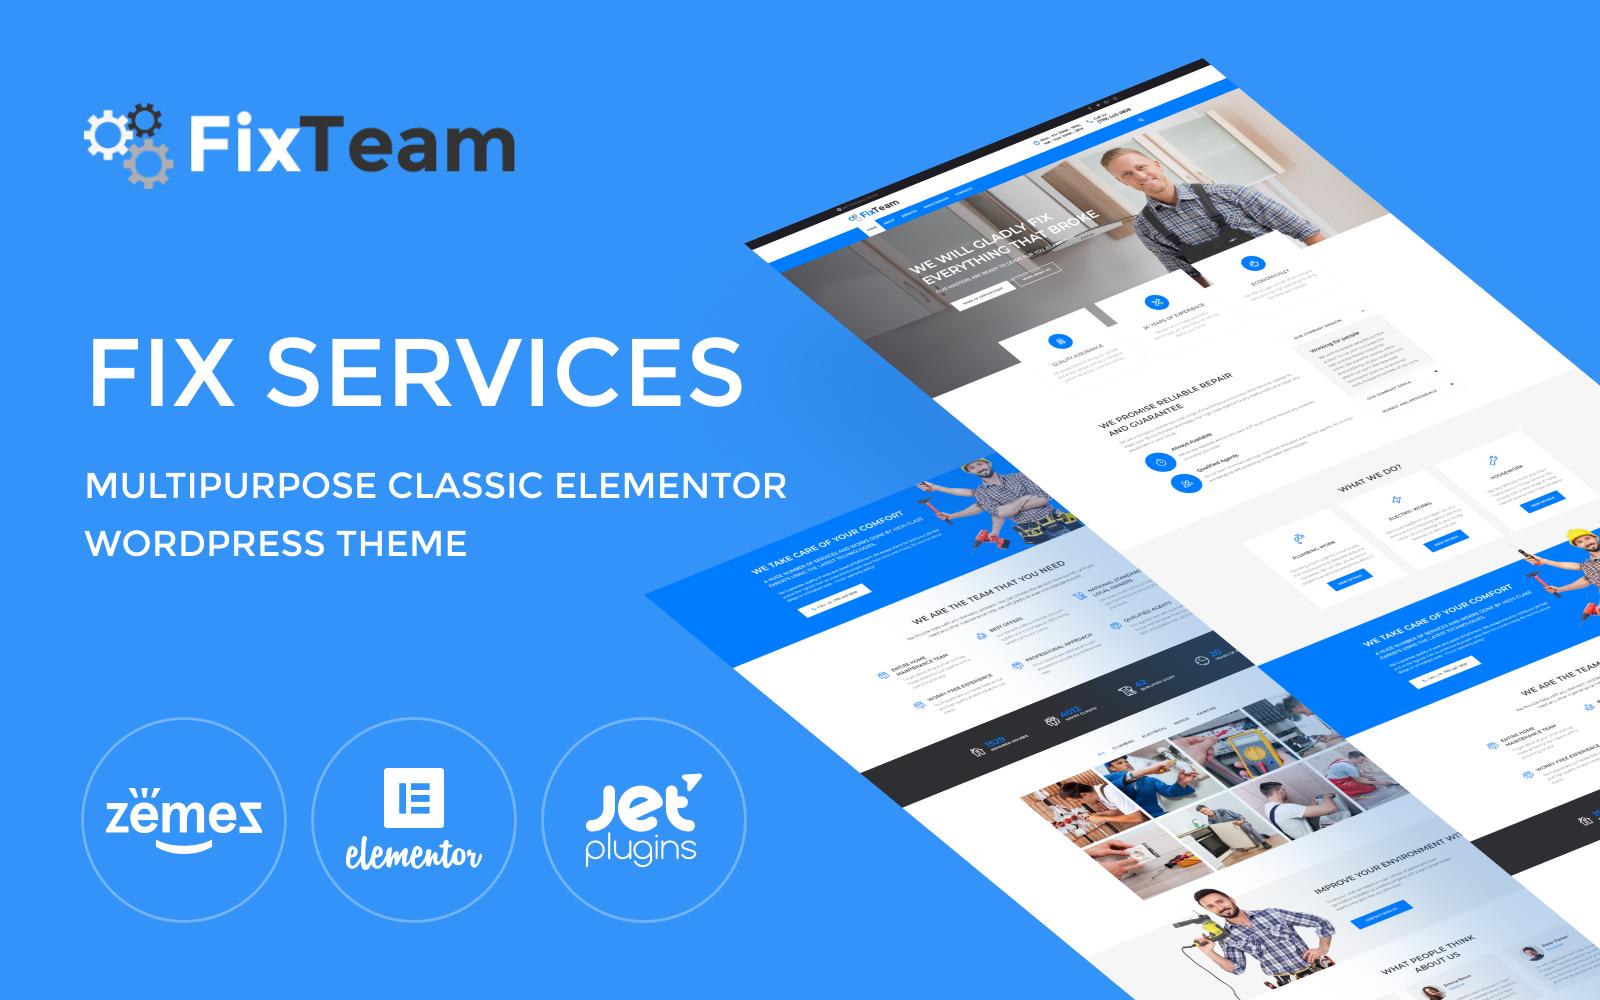 FixTeam - Fix Services Multipurpose Classic Elementor WordPress Theme